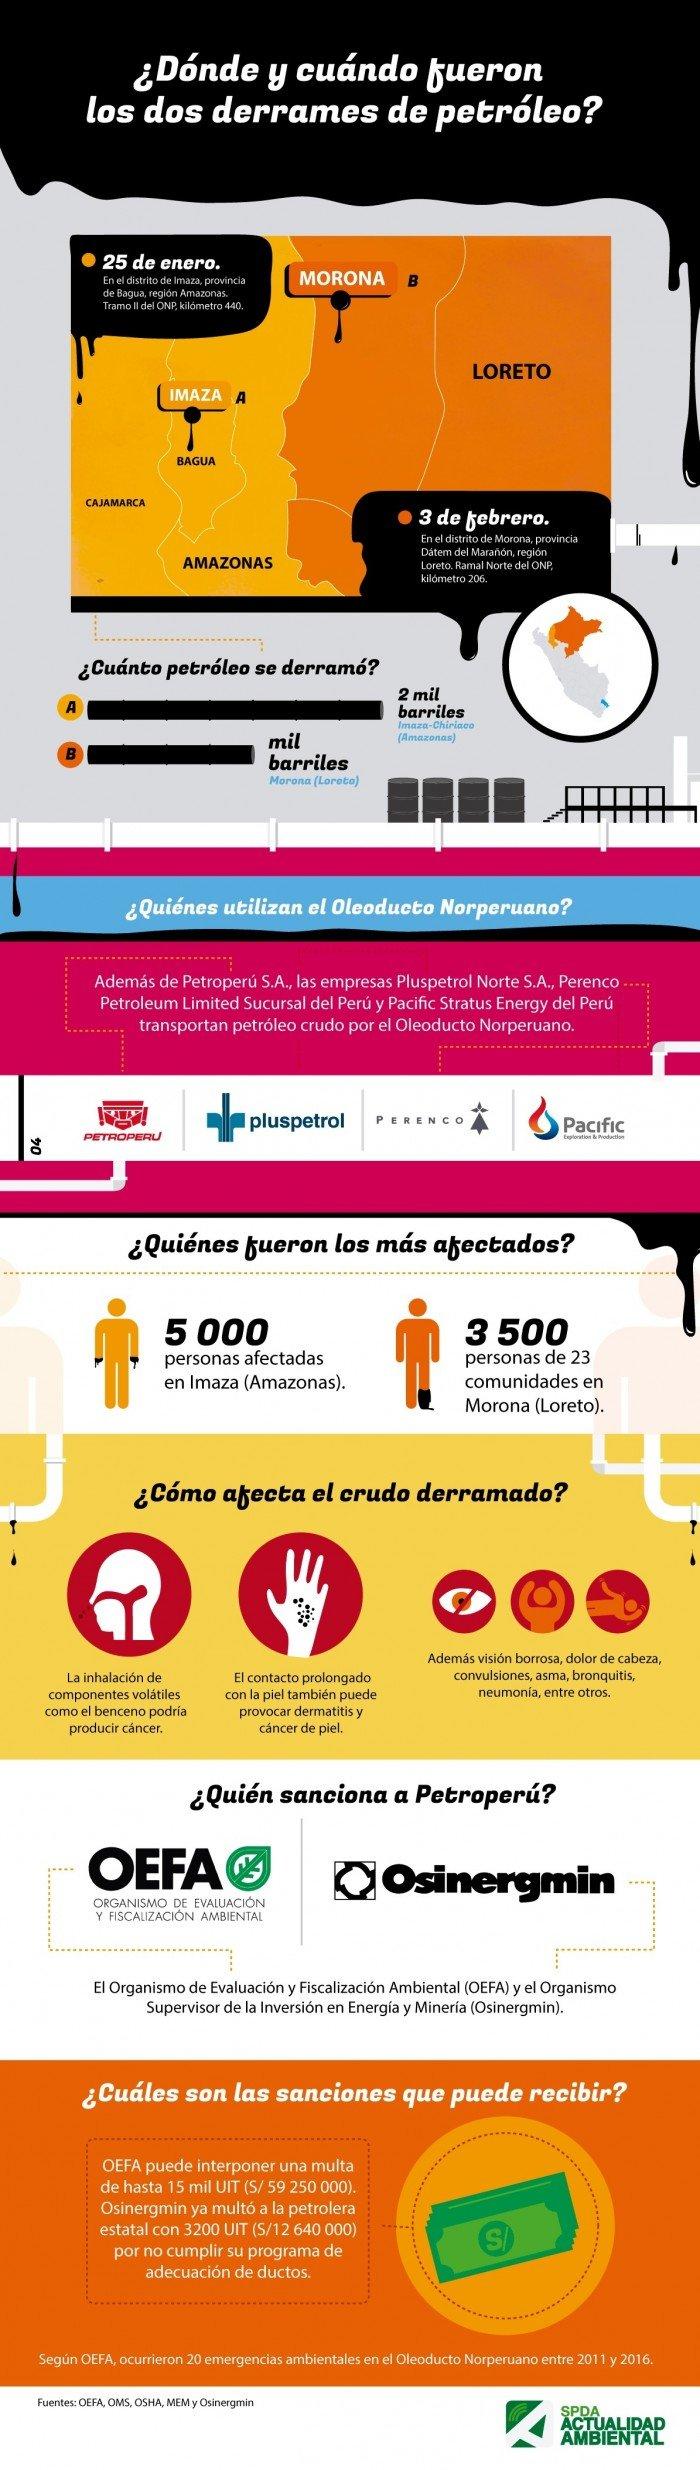 infografia derrames de petroleo